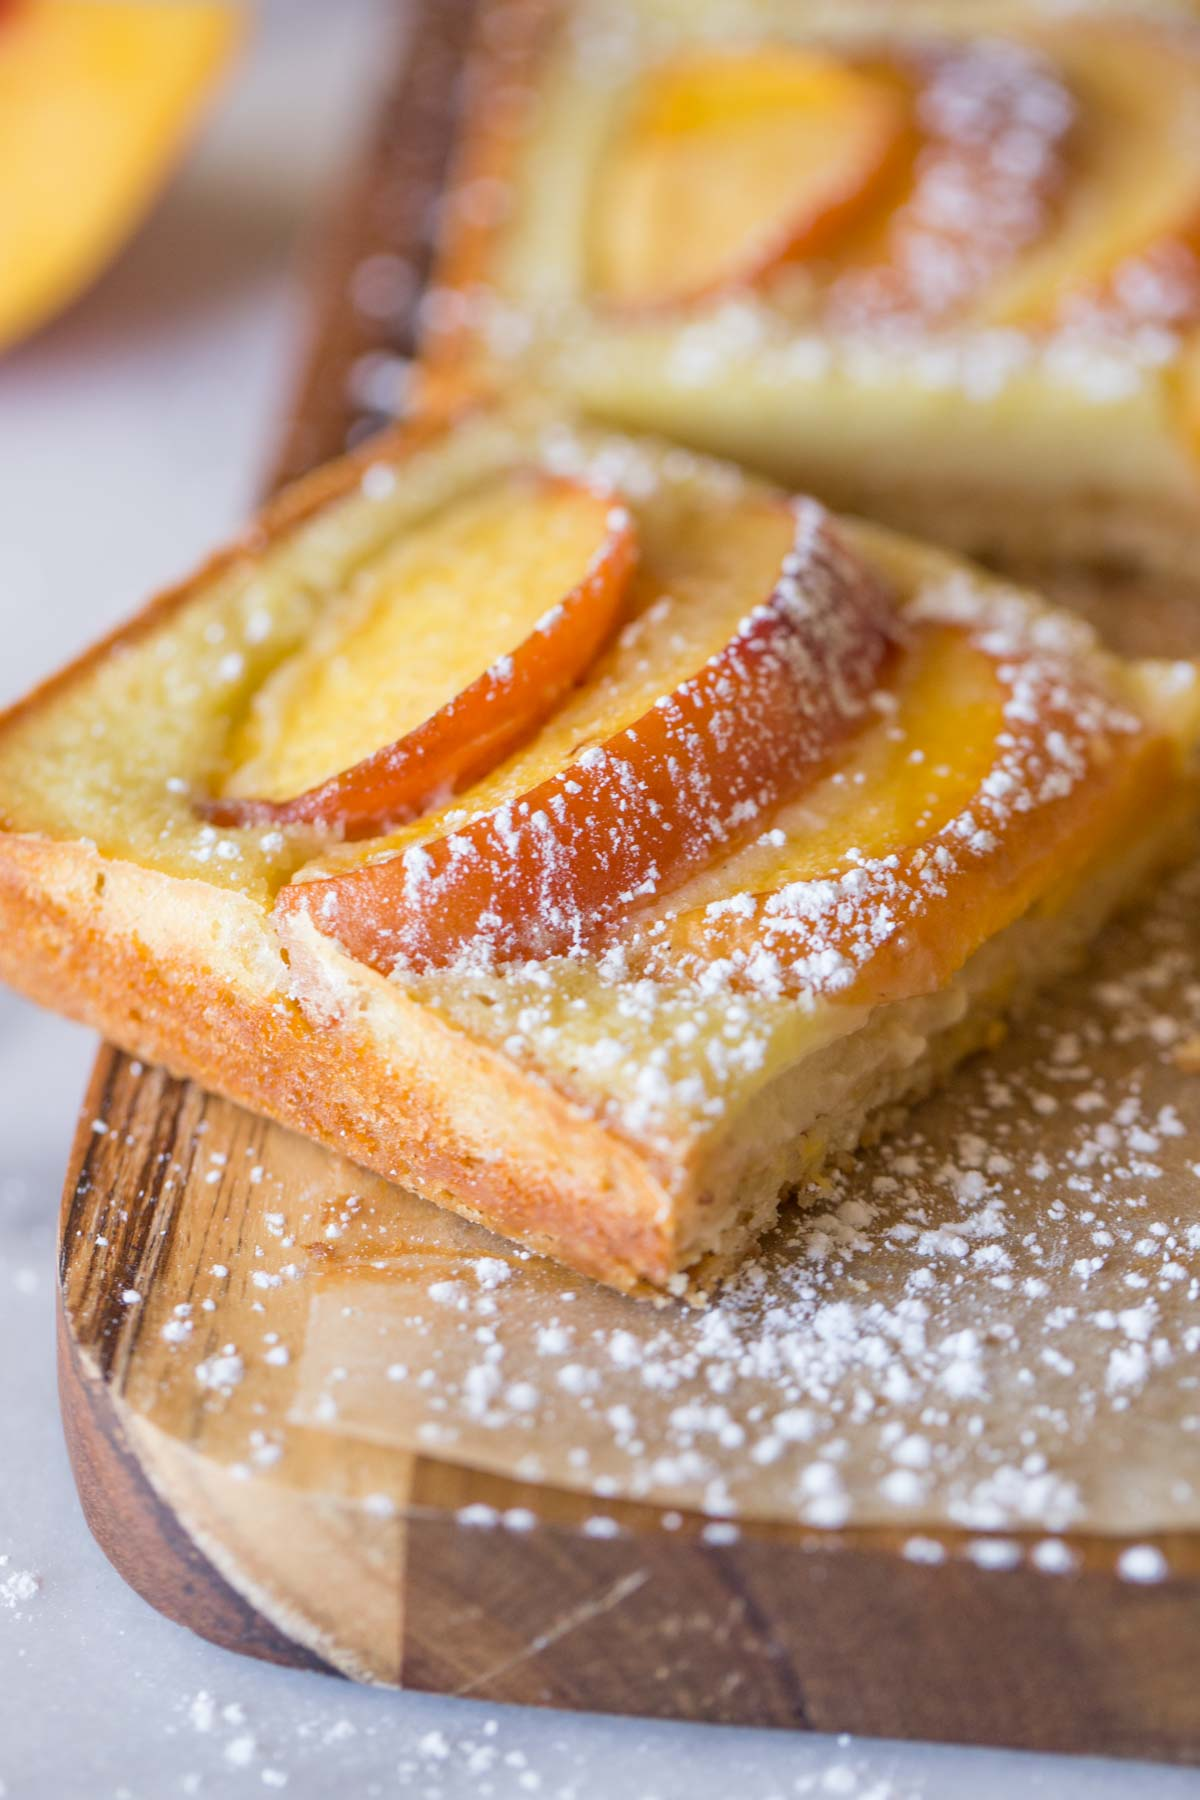 Peaches and Cream Shortbread Bars on a cutting board.